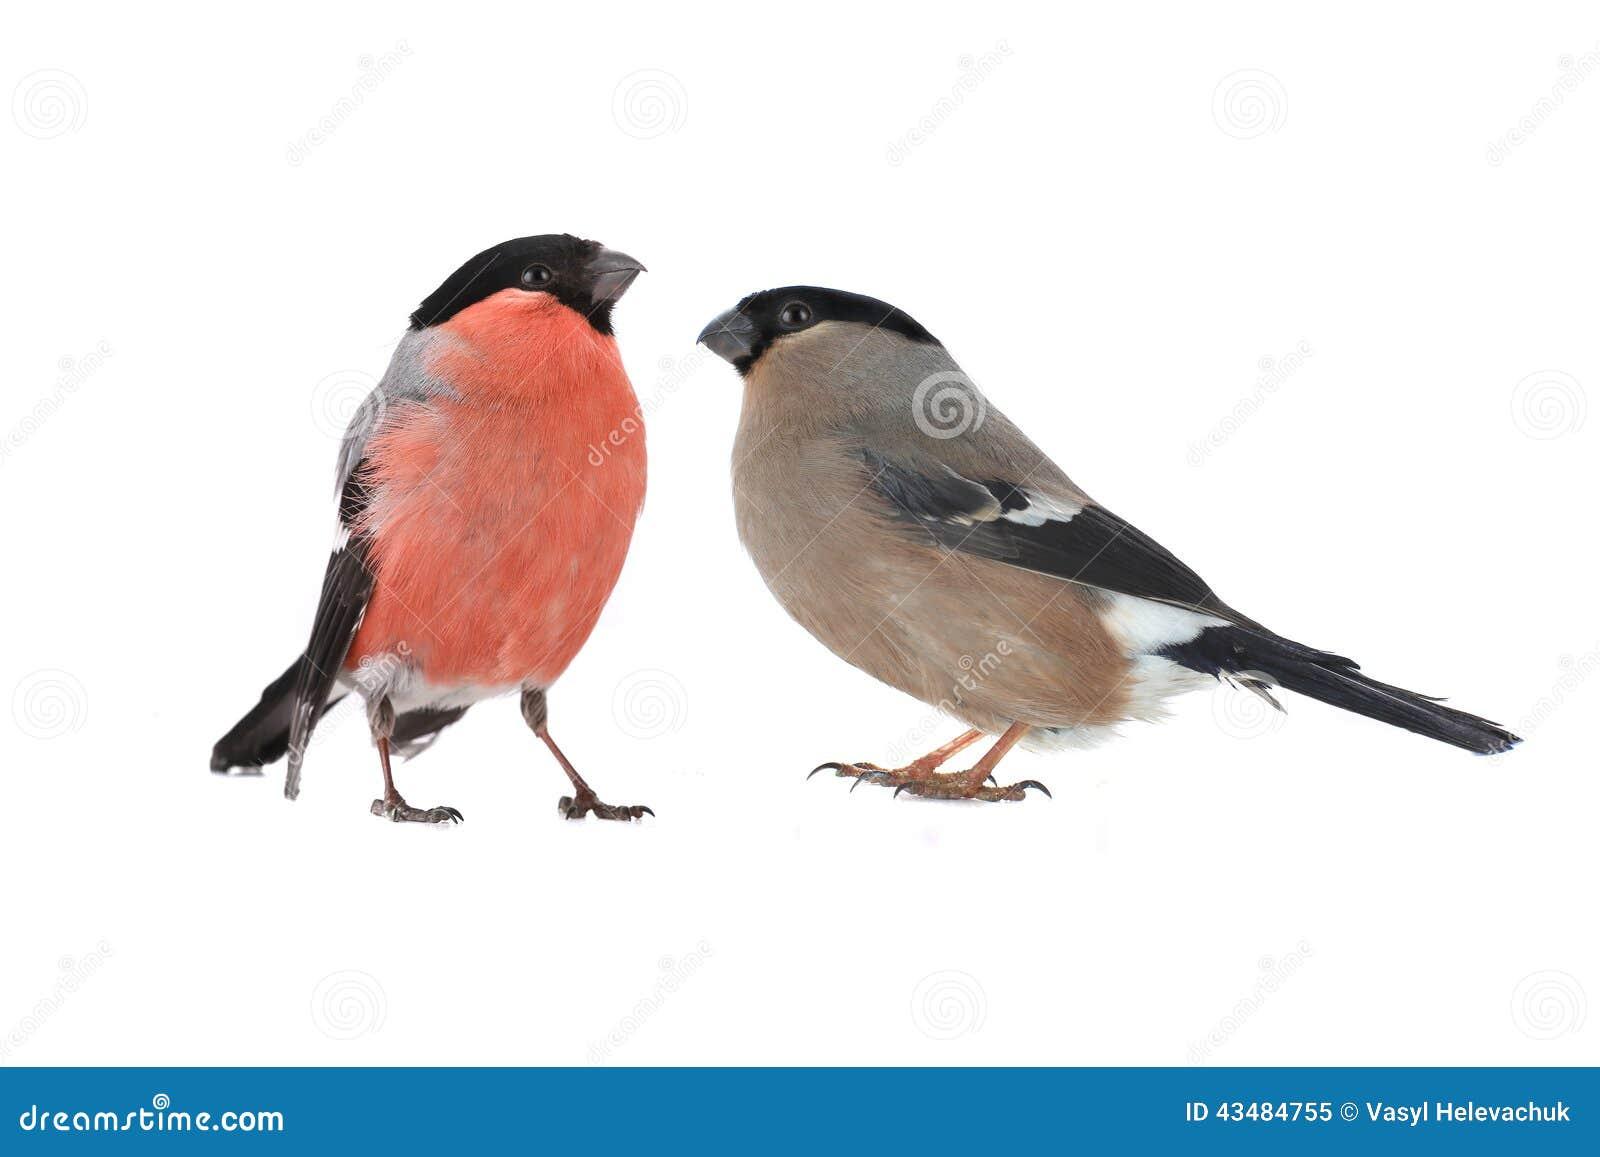 Female Bullfinch Stock Photo - Image: 43484755